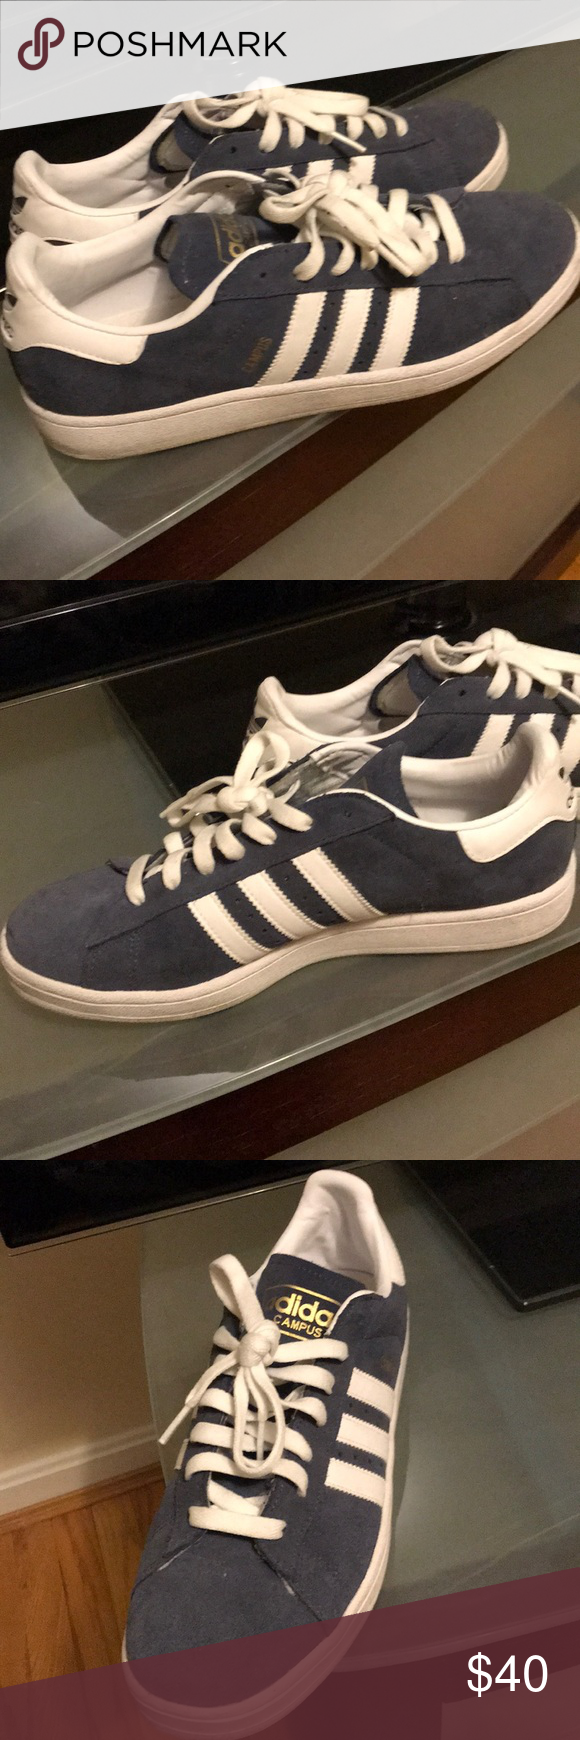 Adidas Men's Campus Shoes Size 10, Like New!   Adidas men, Blue ...